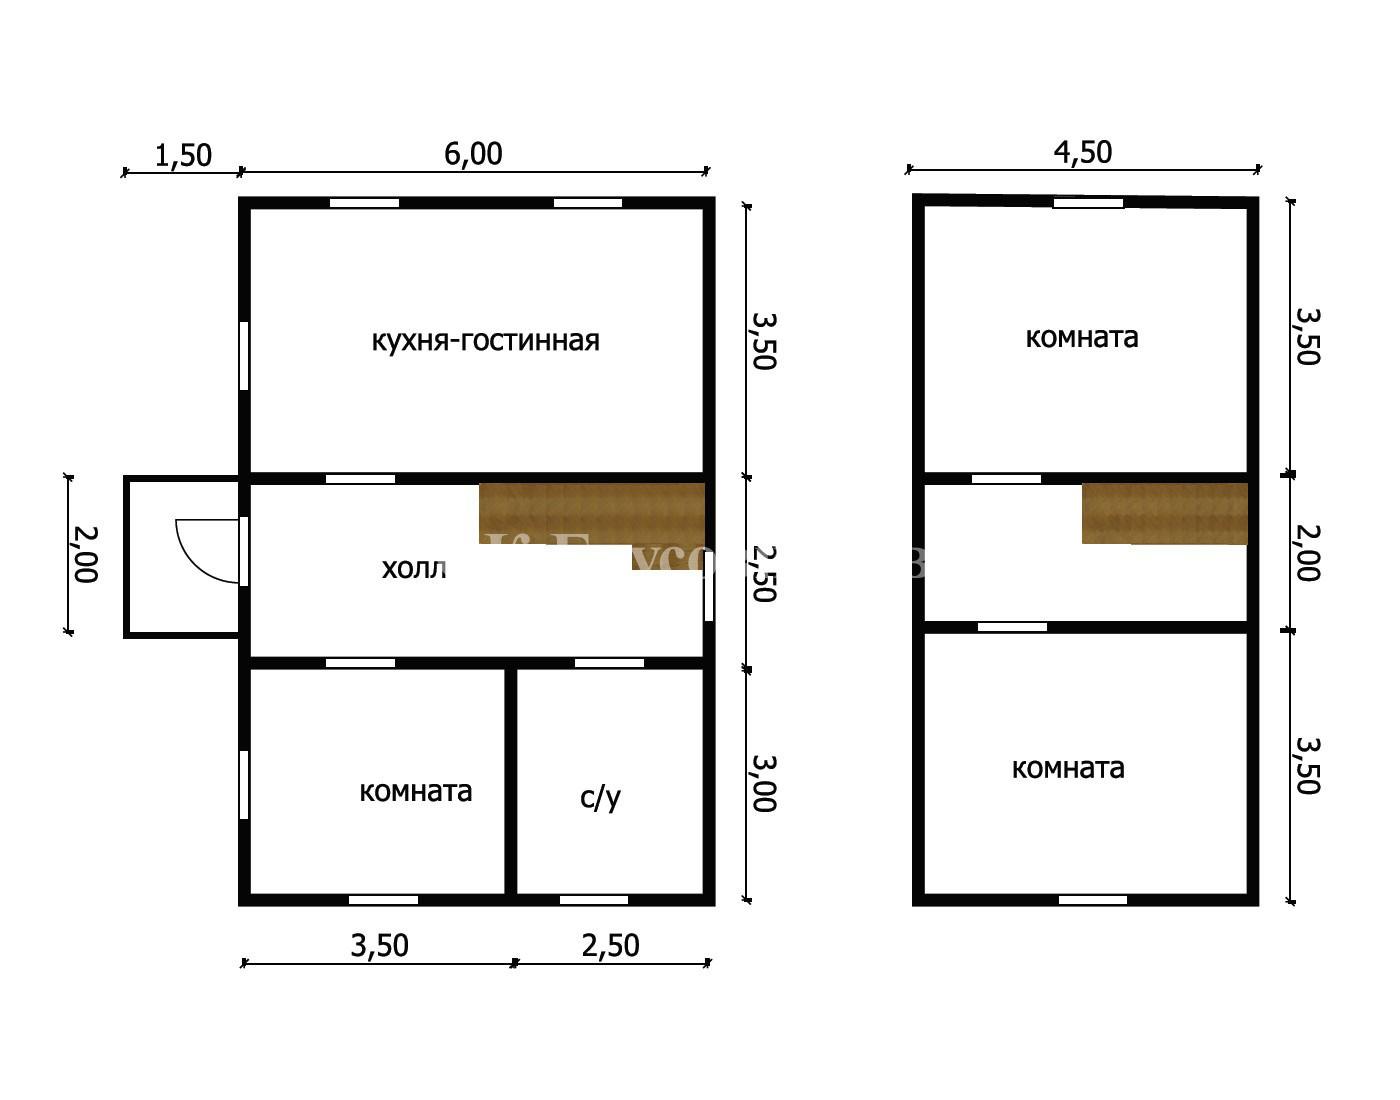 Дом из бруса под усадку 6х9 №9